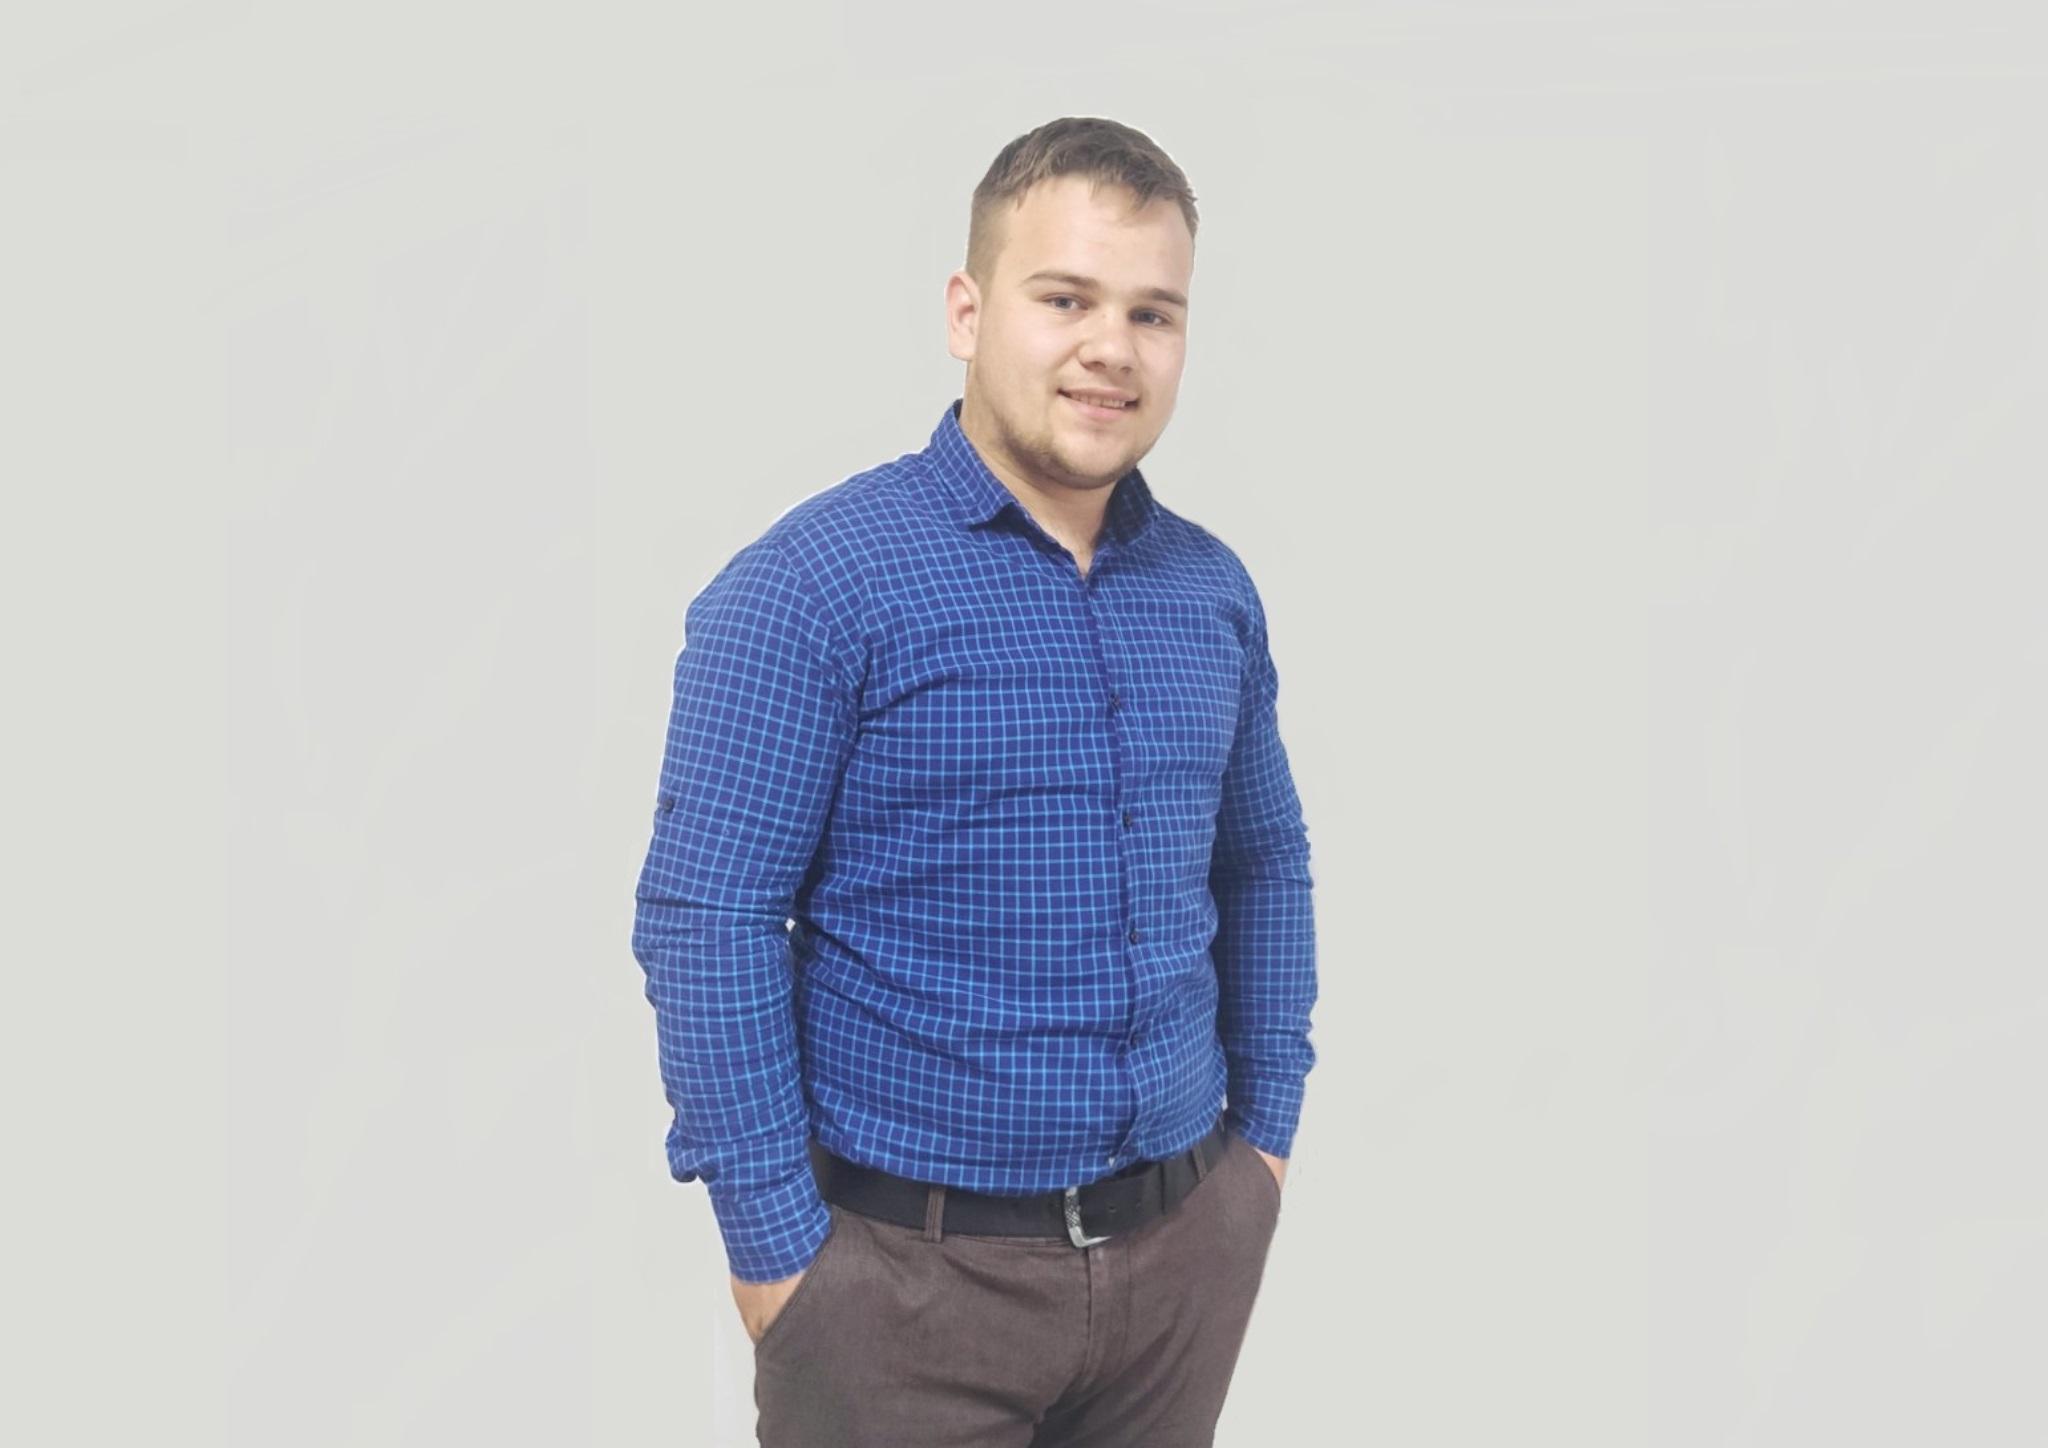 Daniel Crețu